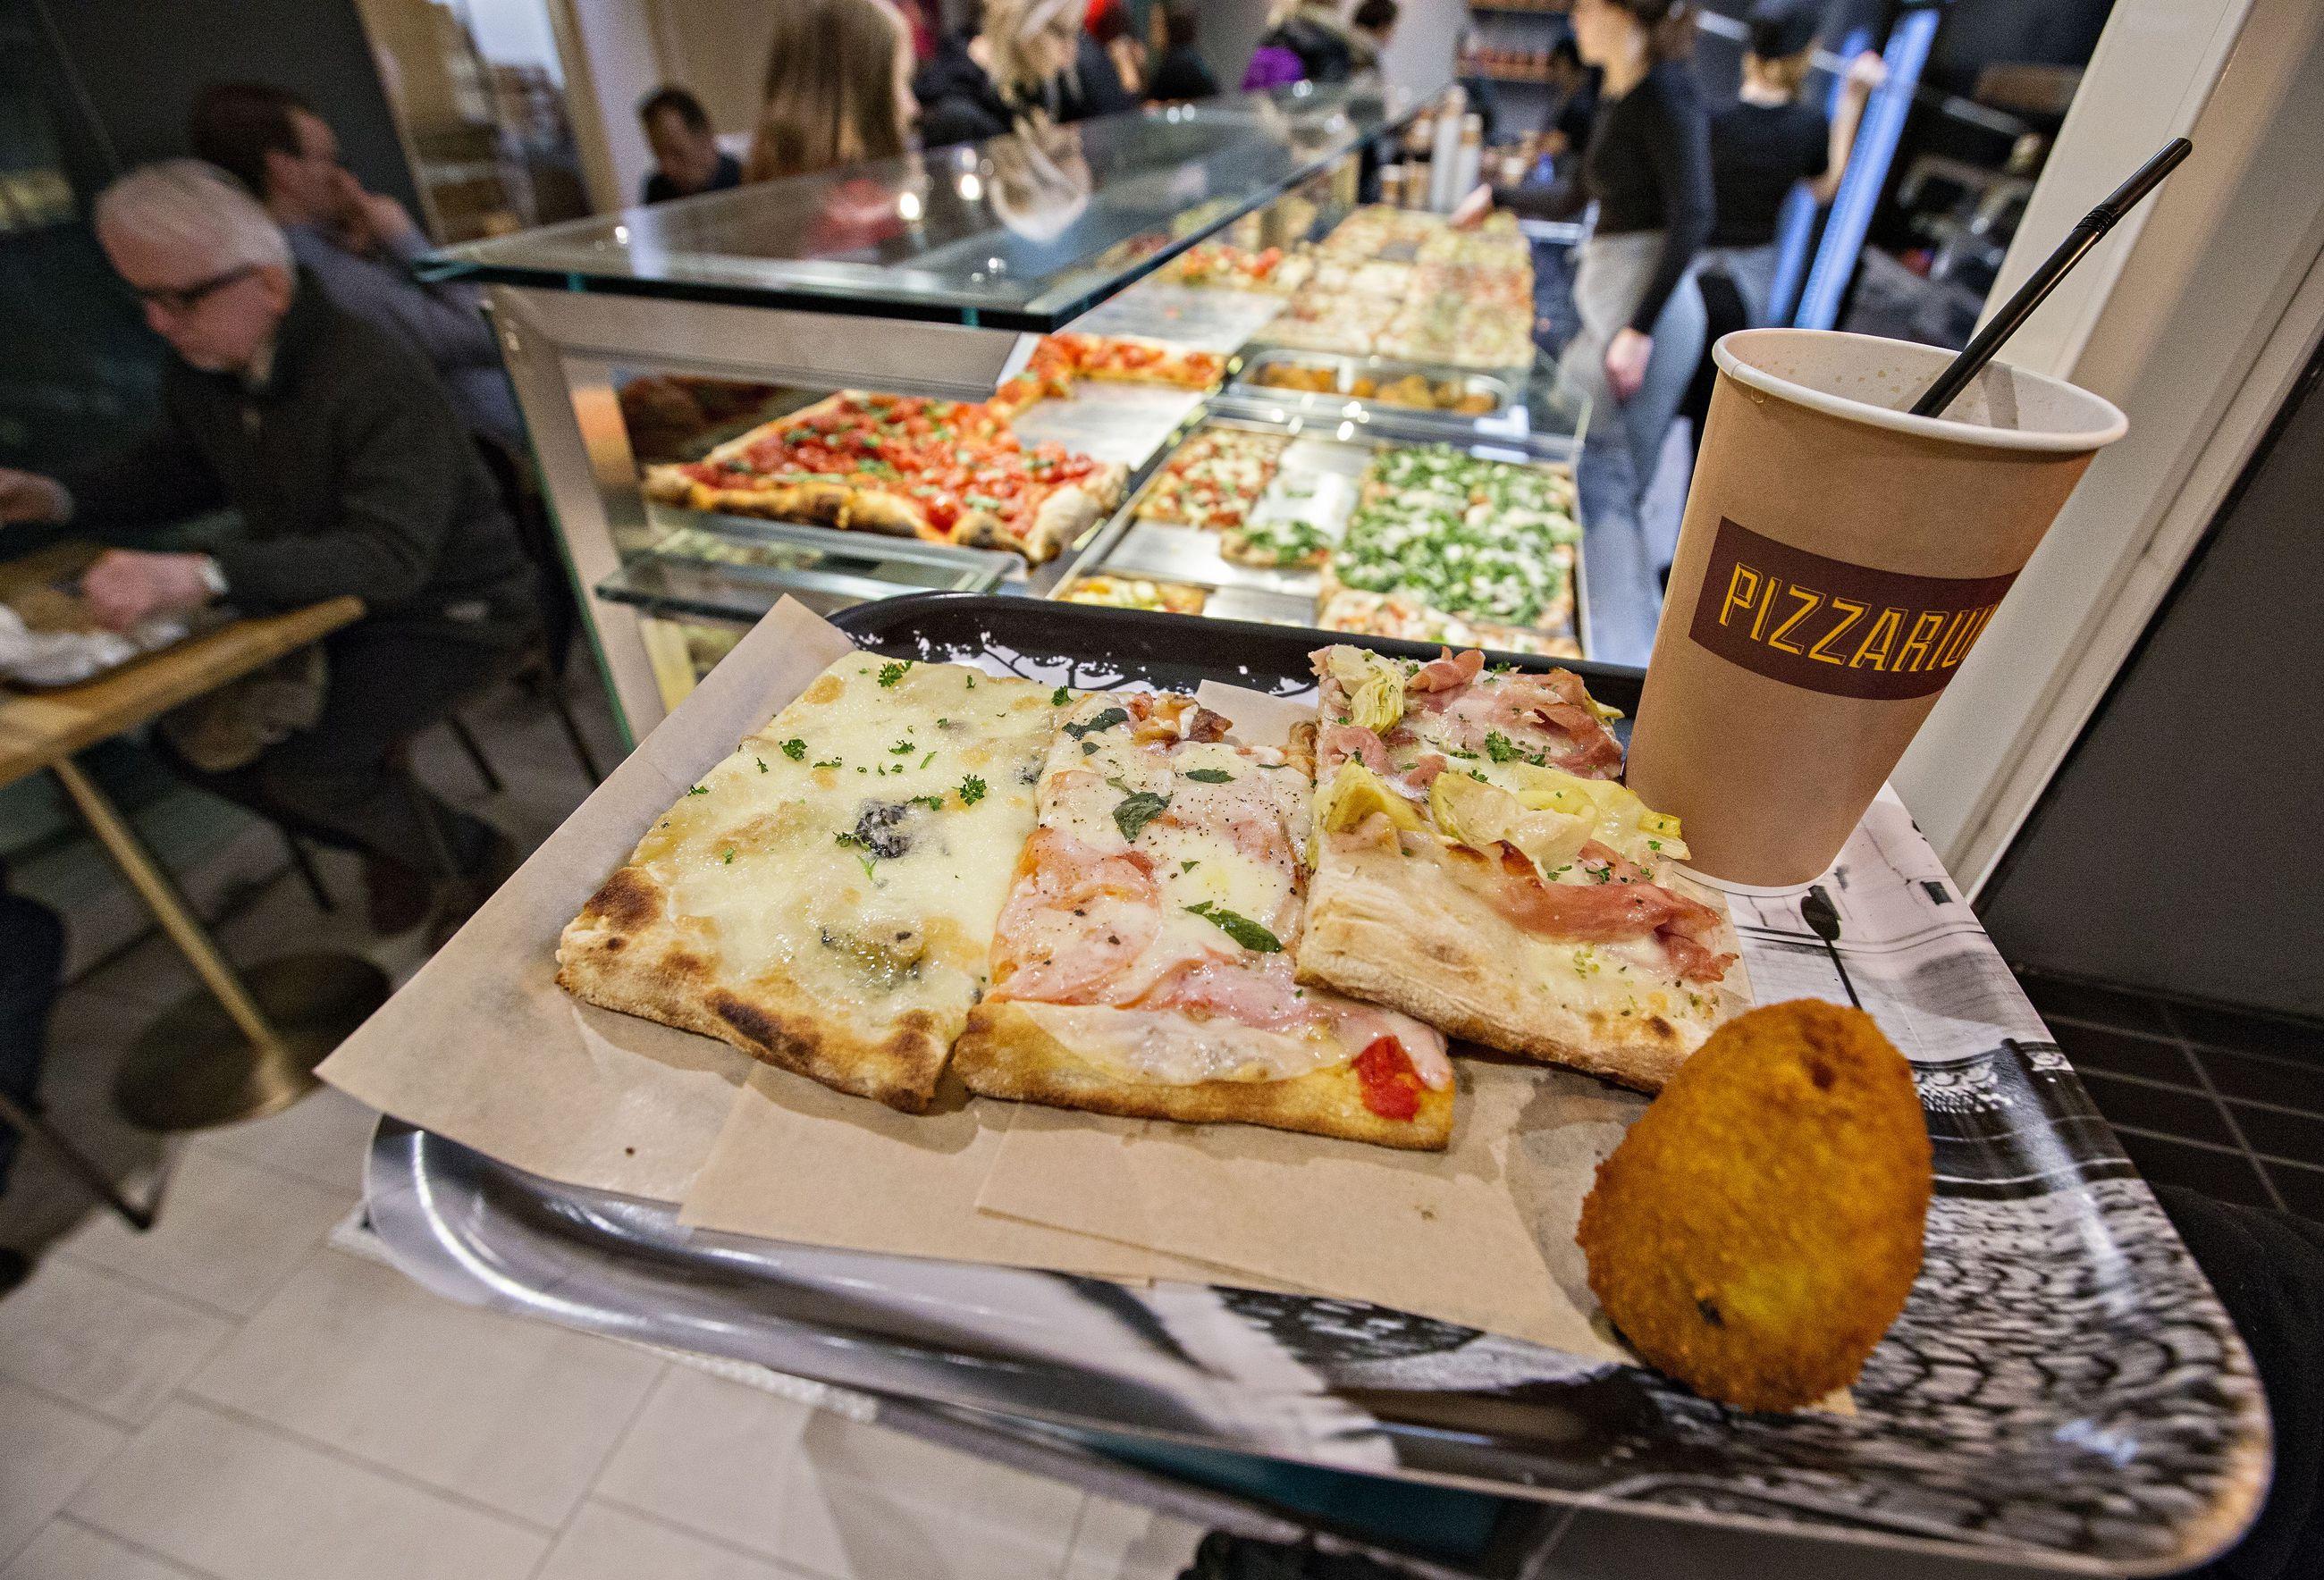 Pizzarium Oulu